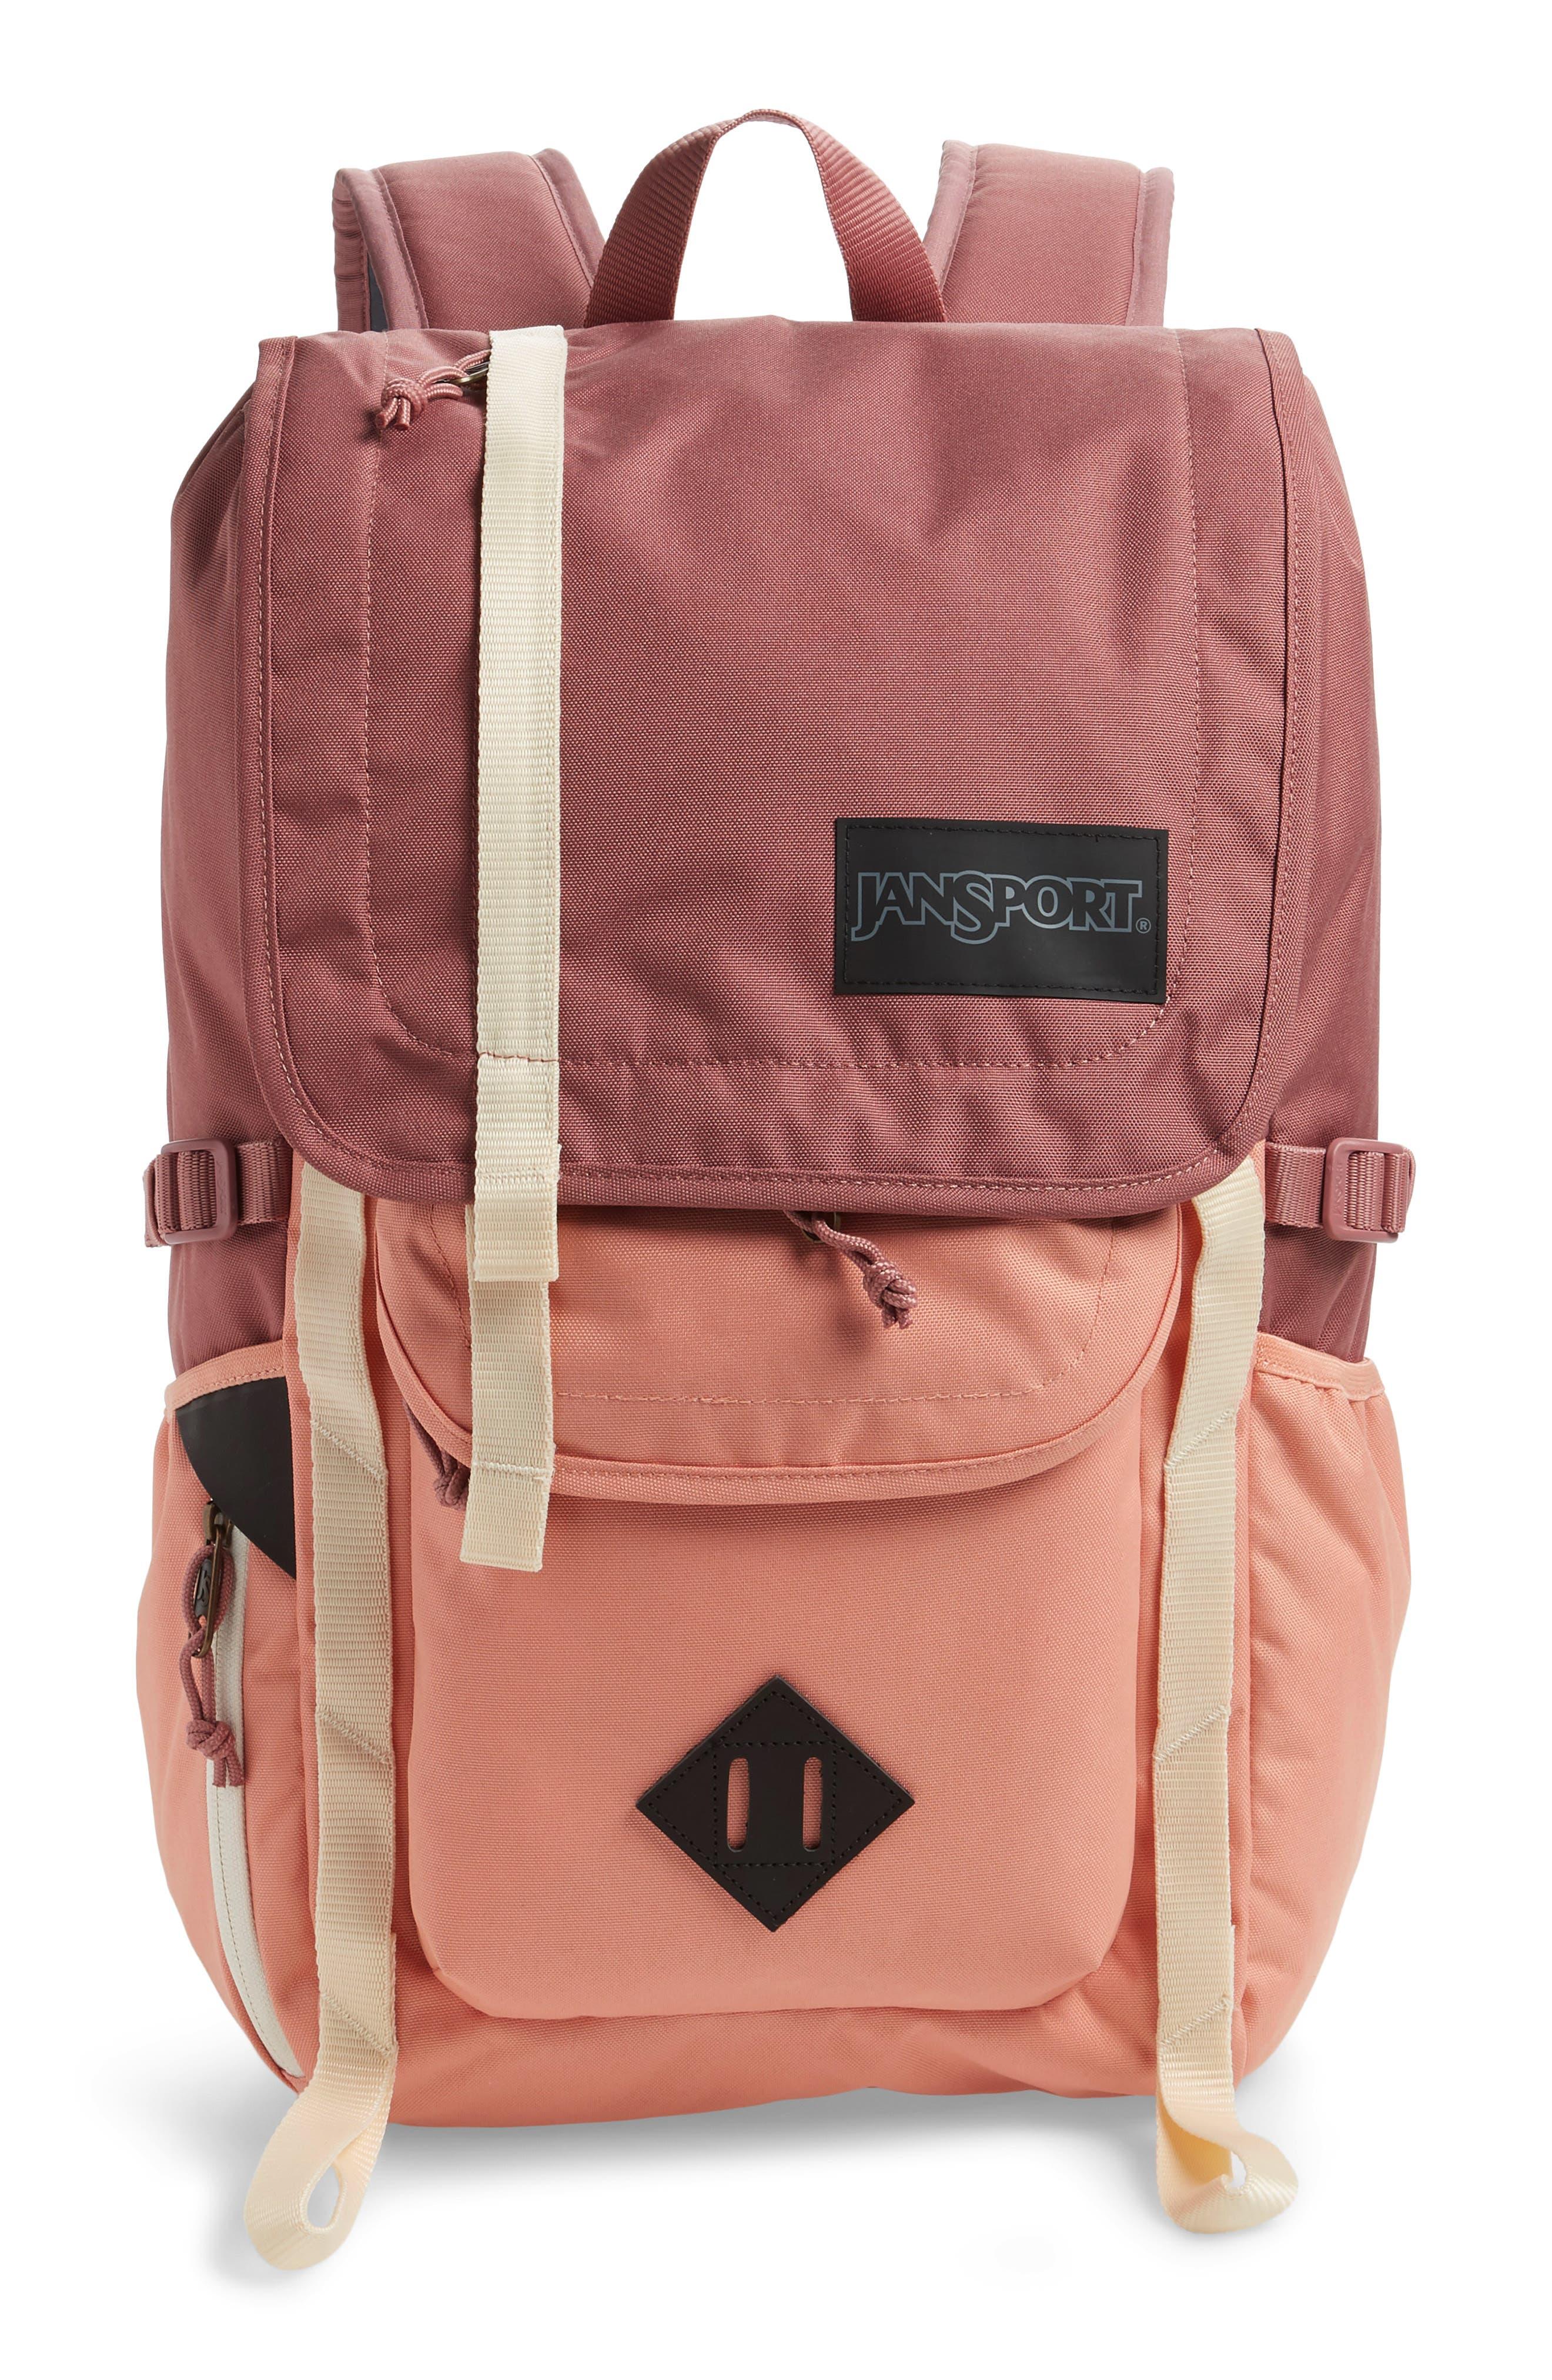 JANSPORT, Hatchet Backpack, Main thumbnail 1, color, MOCHA/ CLAY